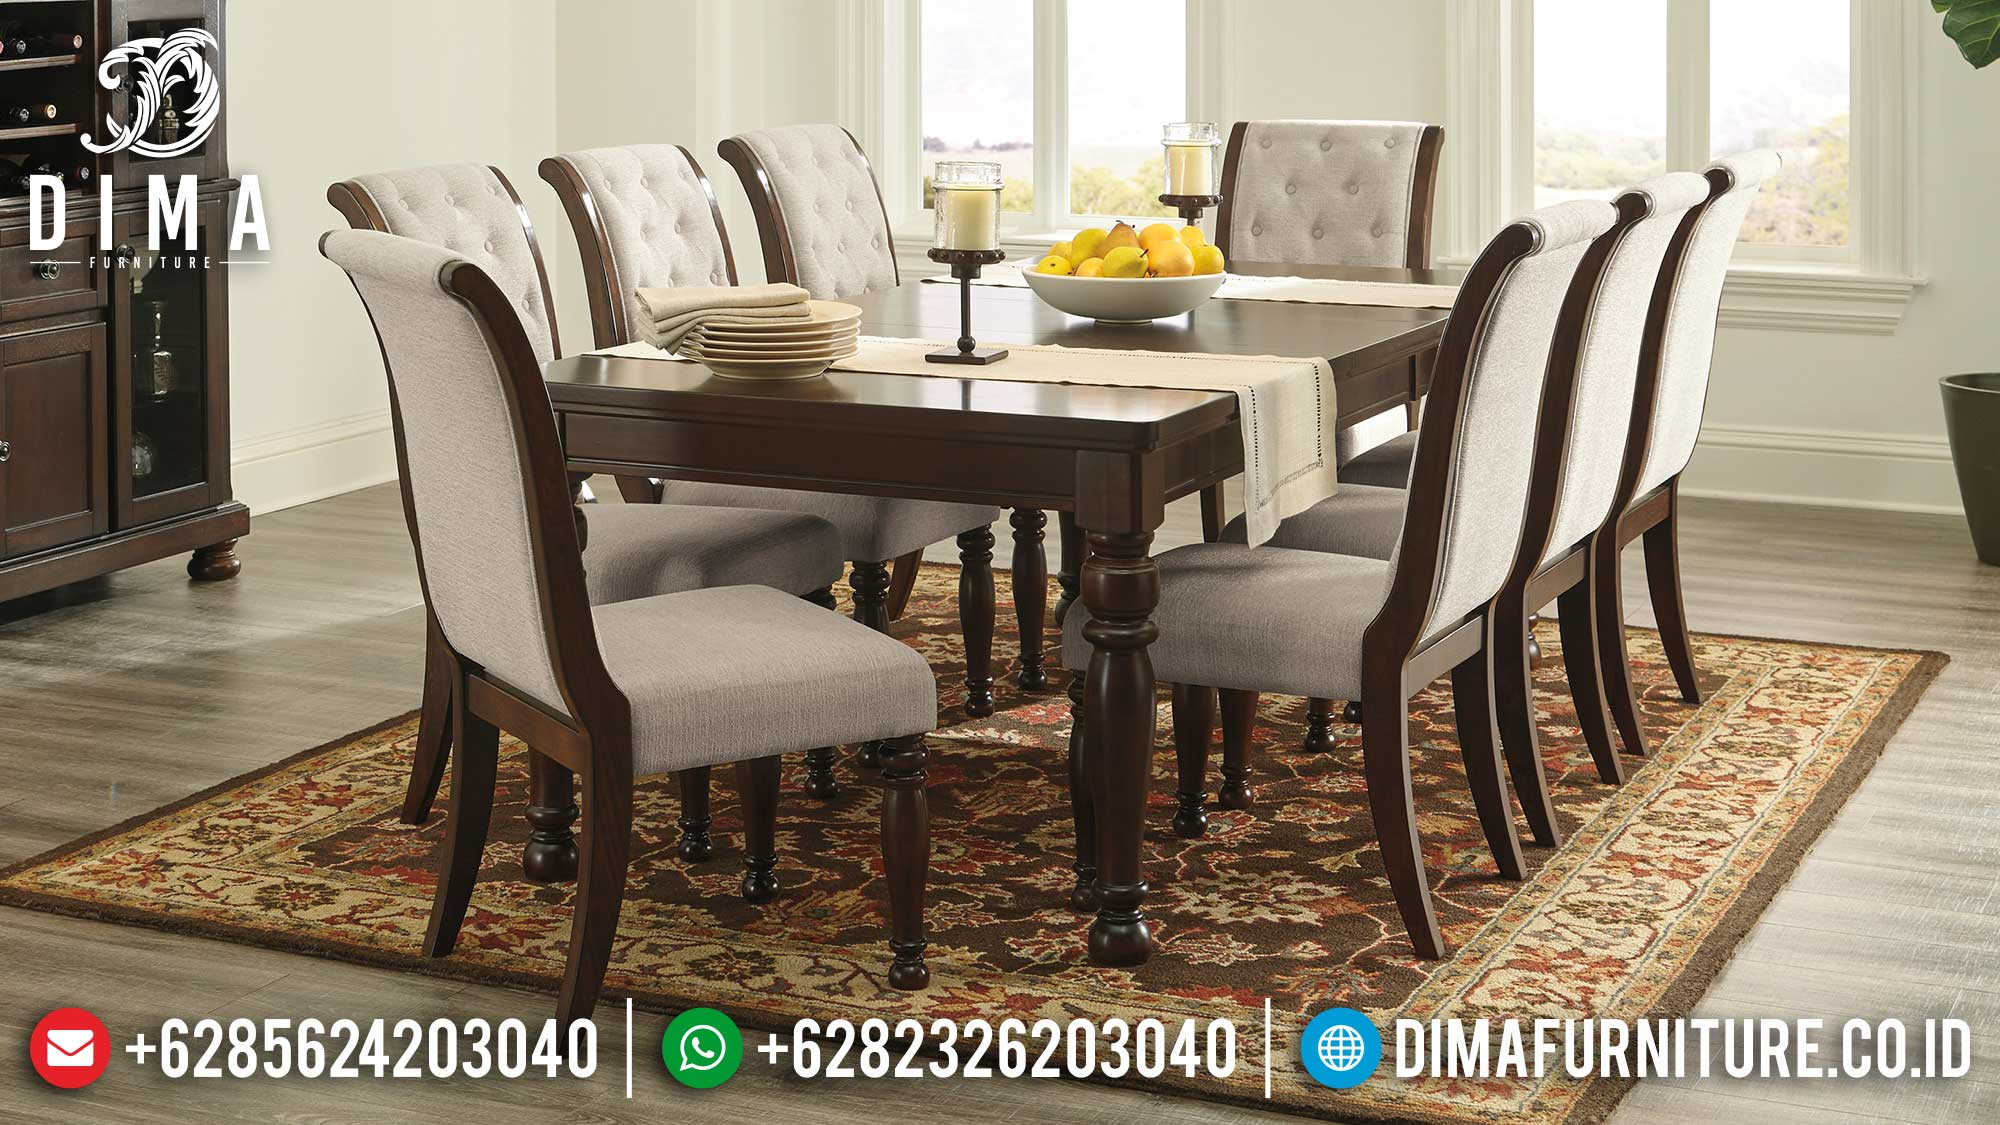 Buy Now Meja Makan Minimalis Jepara Best Seller Item Terbaru ST-1129